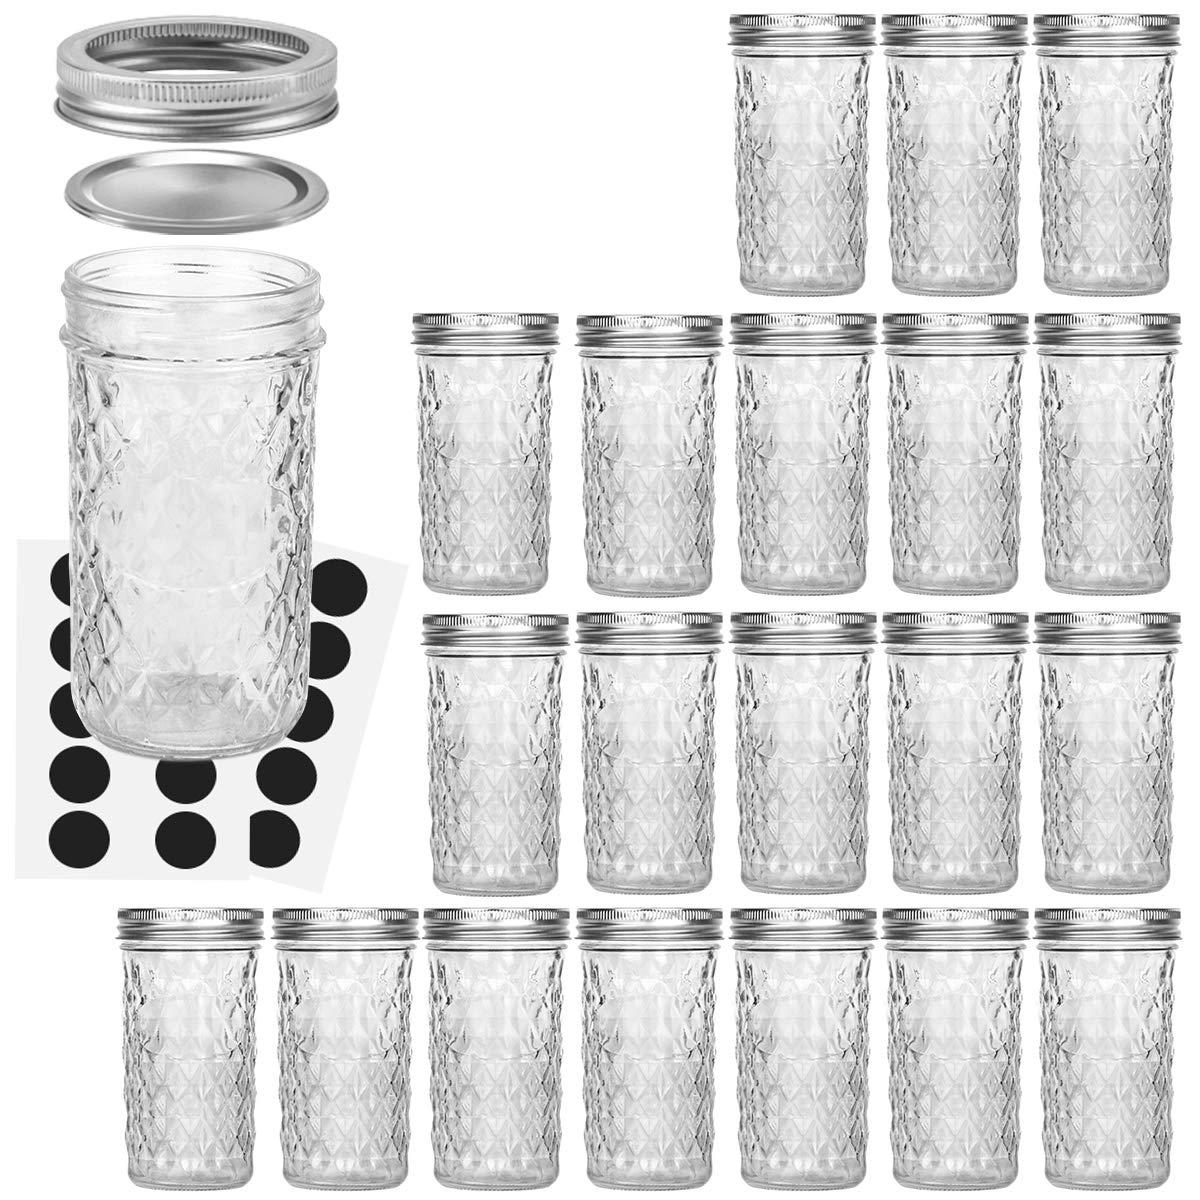 Mason Jars 12 OZ, VERONES Canning Jars Jelly Jars With Regular Lids, Ideal for Jam, Honey, Wedding Favors, Shower Favors, Baby Foods, 20 PACK